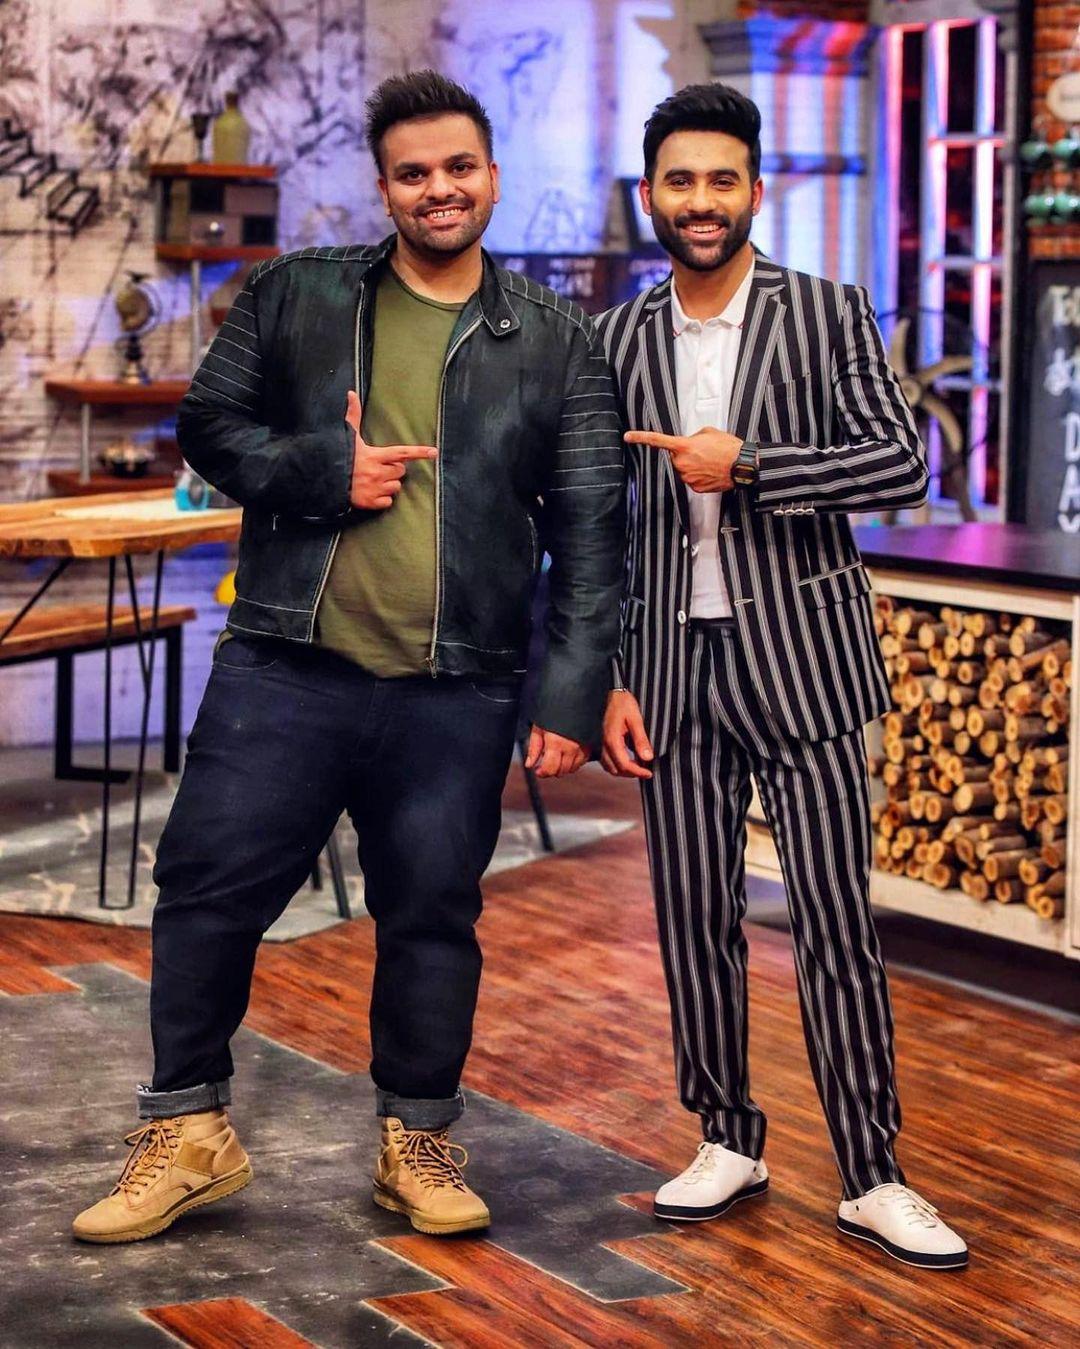 Aadi Adeal Amjad and Faizan Shaikh